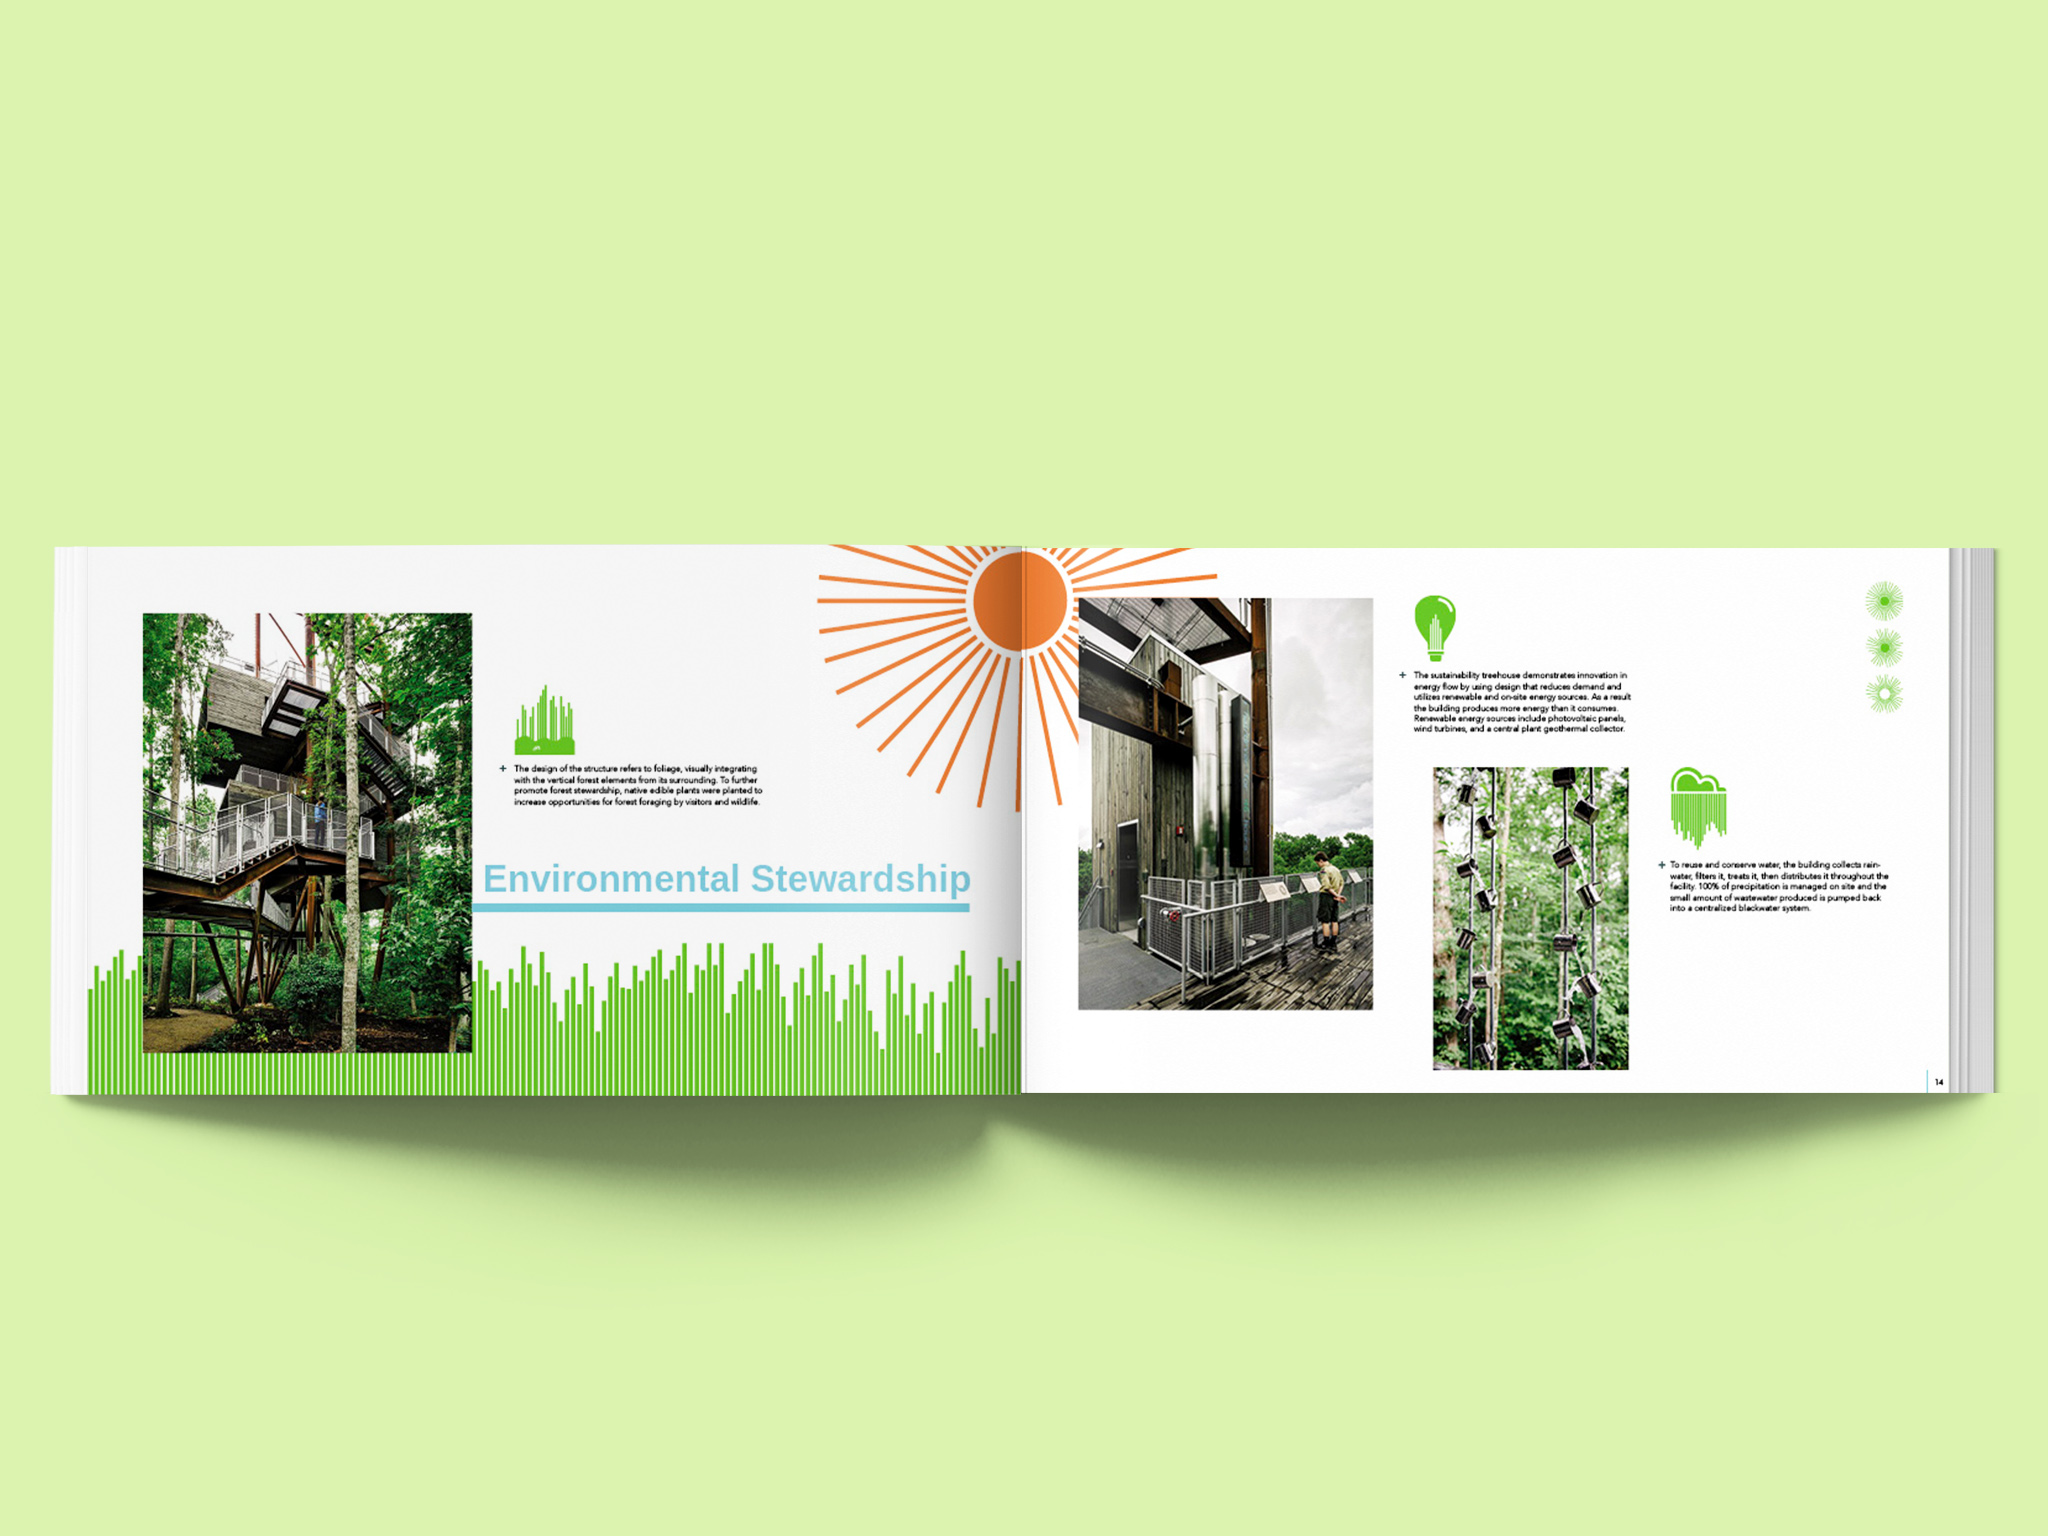 mithun_page5_green.jpg